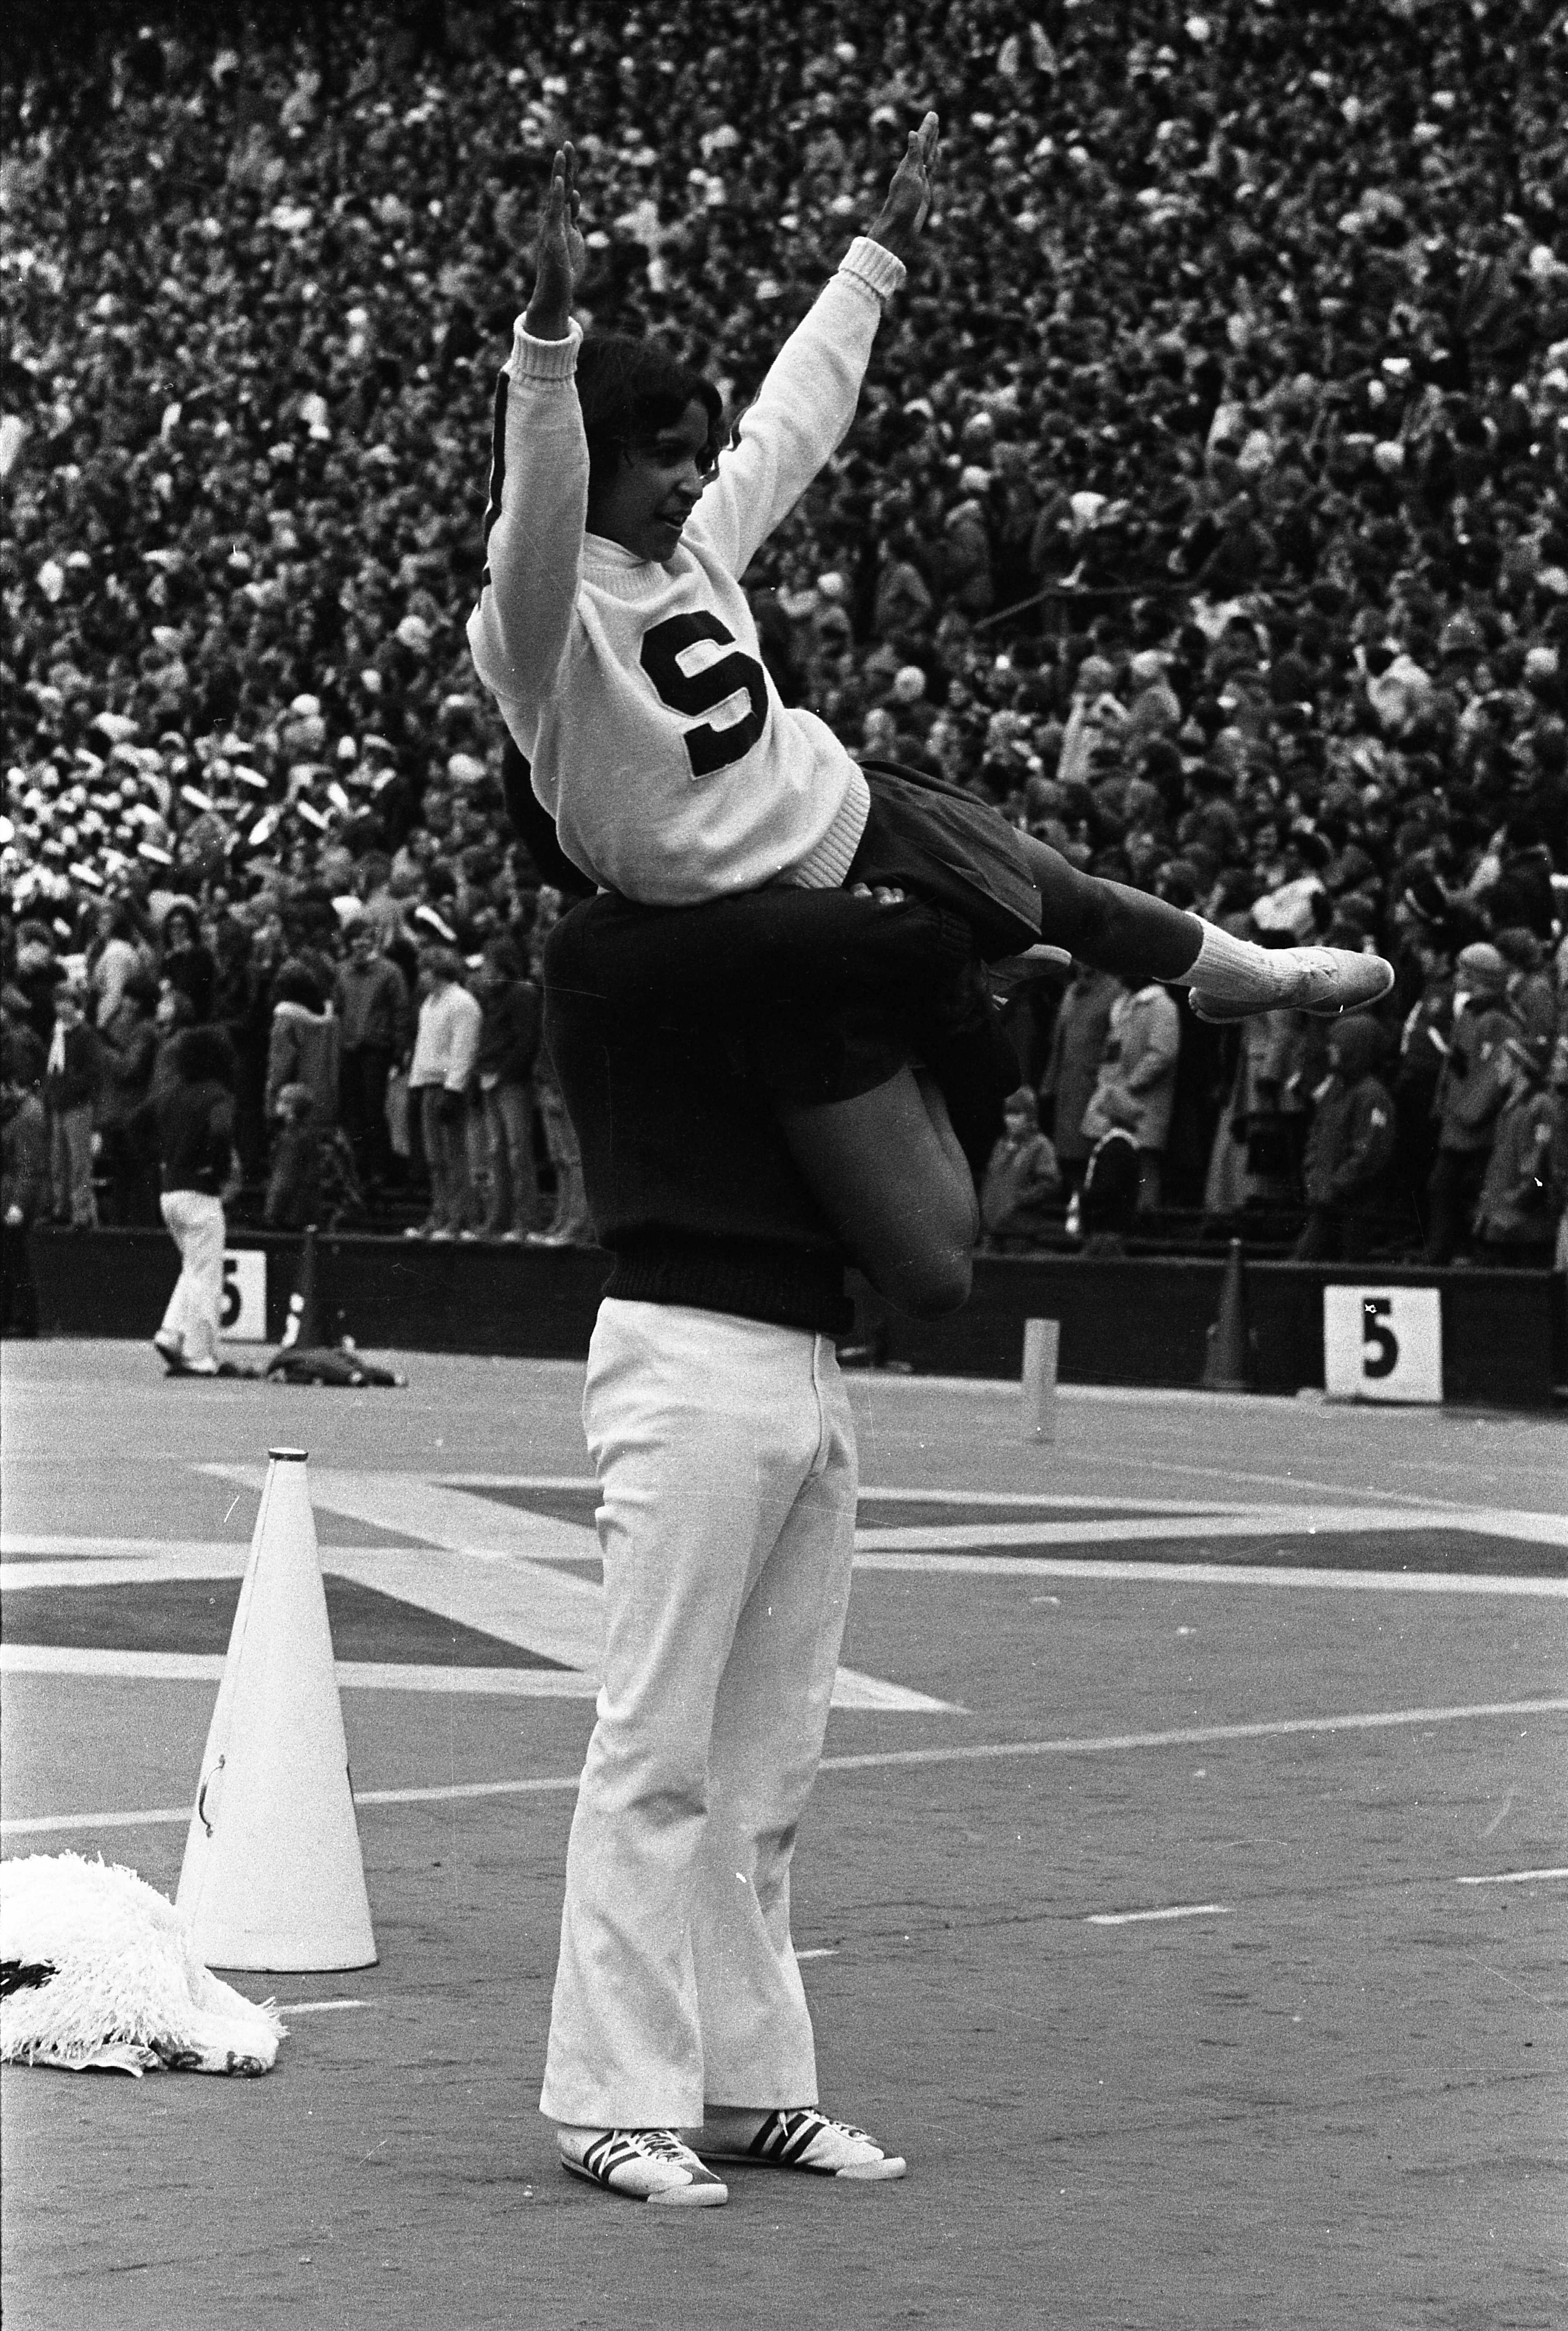 Cheerleaders at the MSU vs Ohio State game, 1972